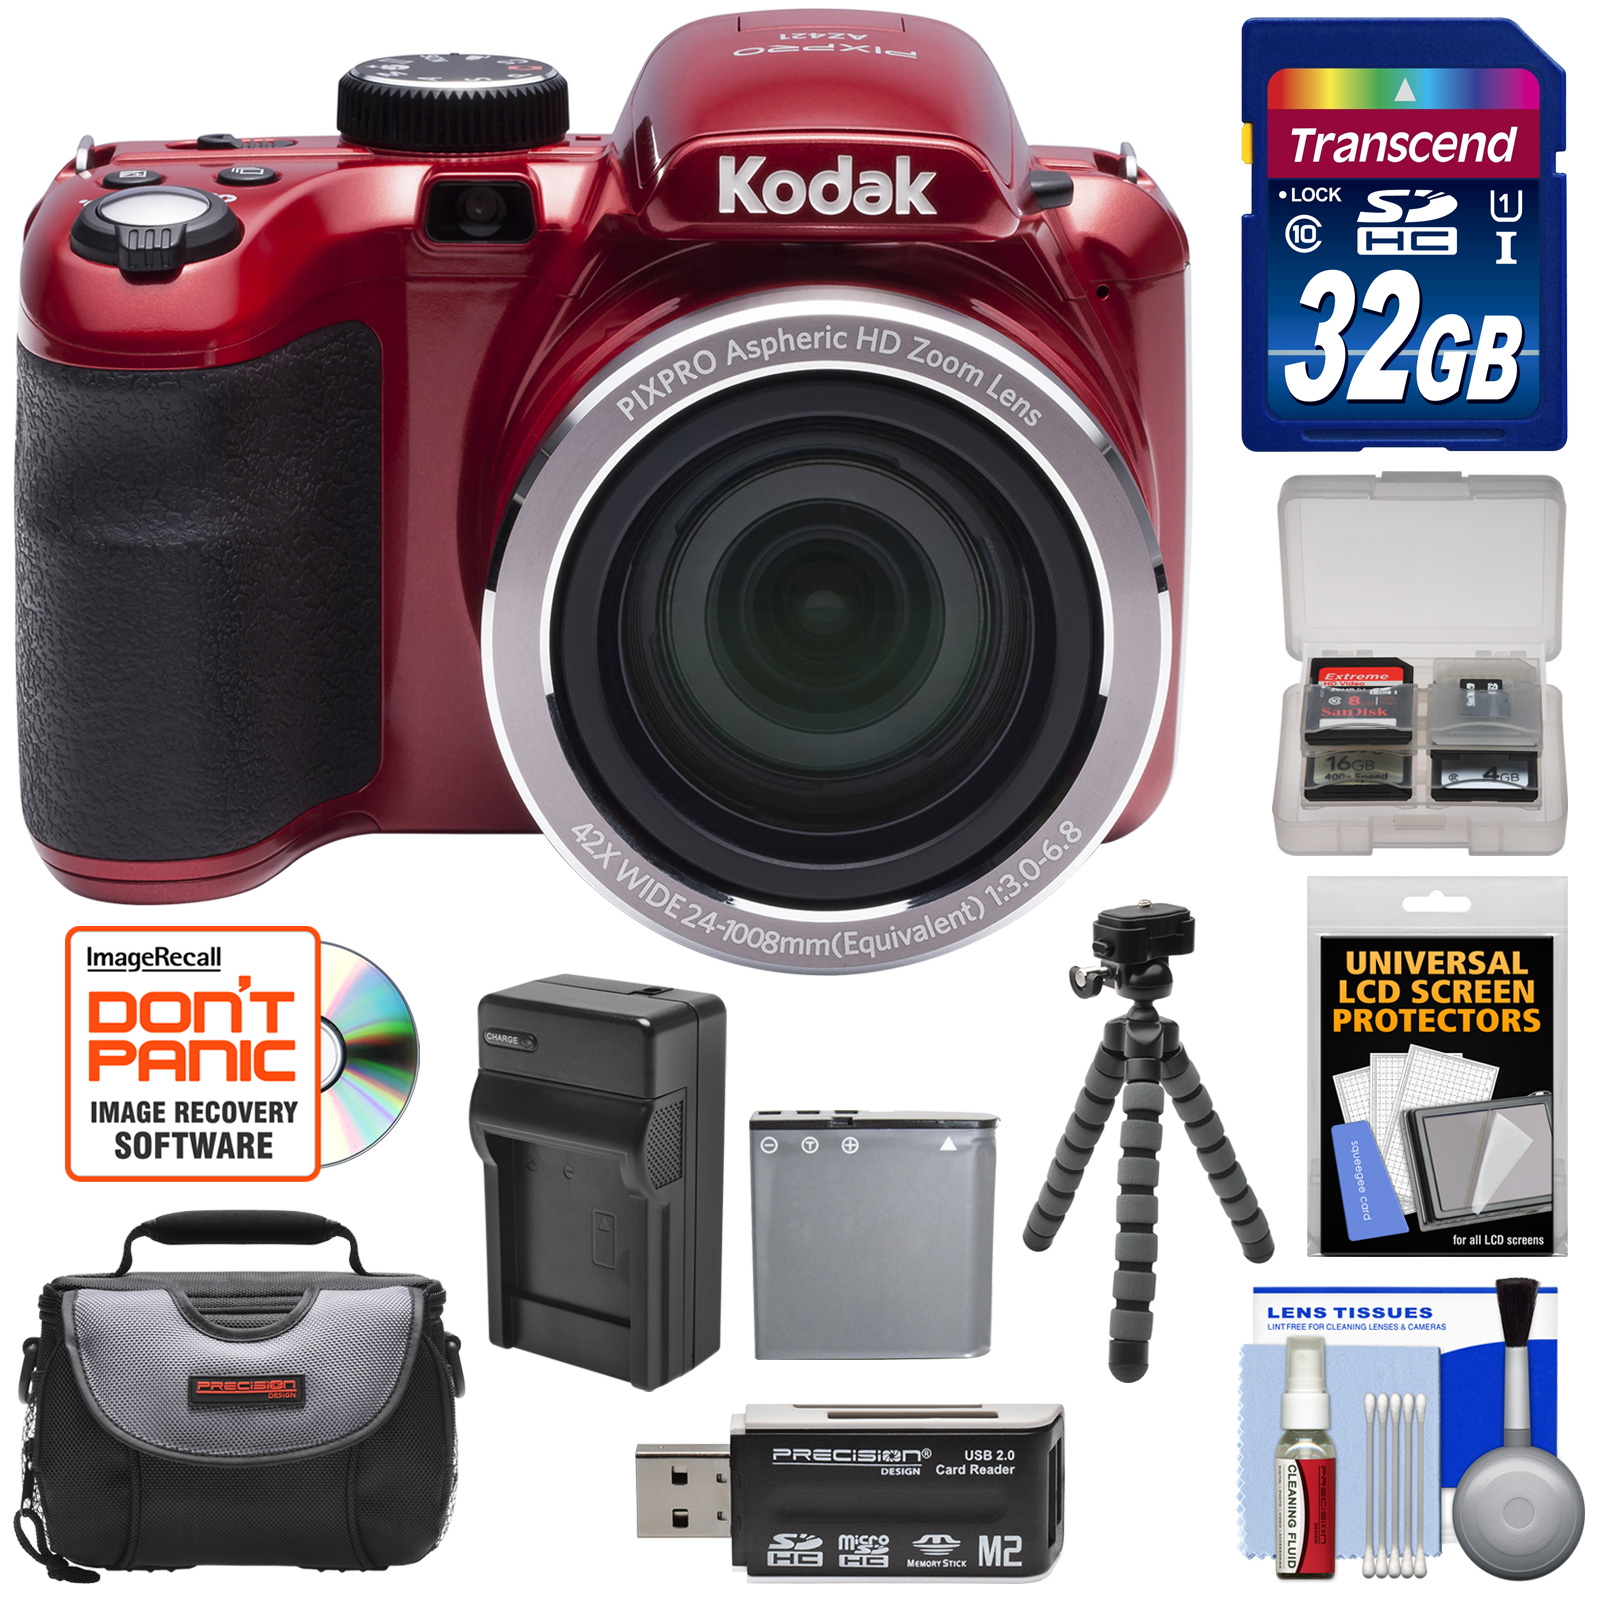 KODAK PIXPRO AZ421 Astro Zoom Digital Camera (White) with 32GB Card + Case + Battery/Charger + Flex Tripod + Kit